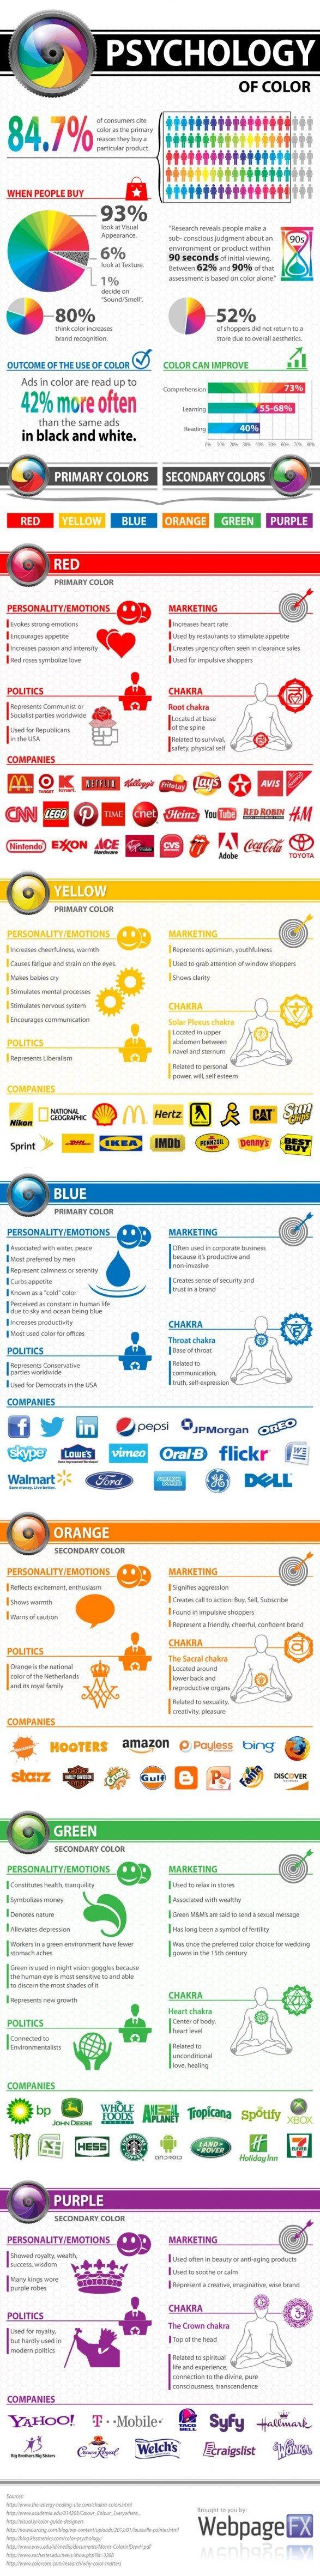 Color Psychology personality, politics, chakras, emotions